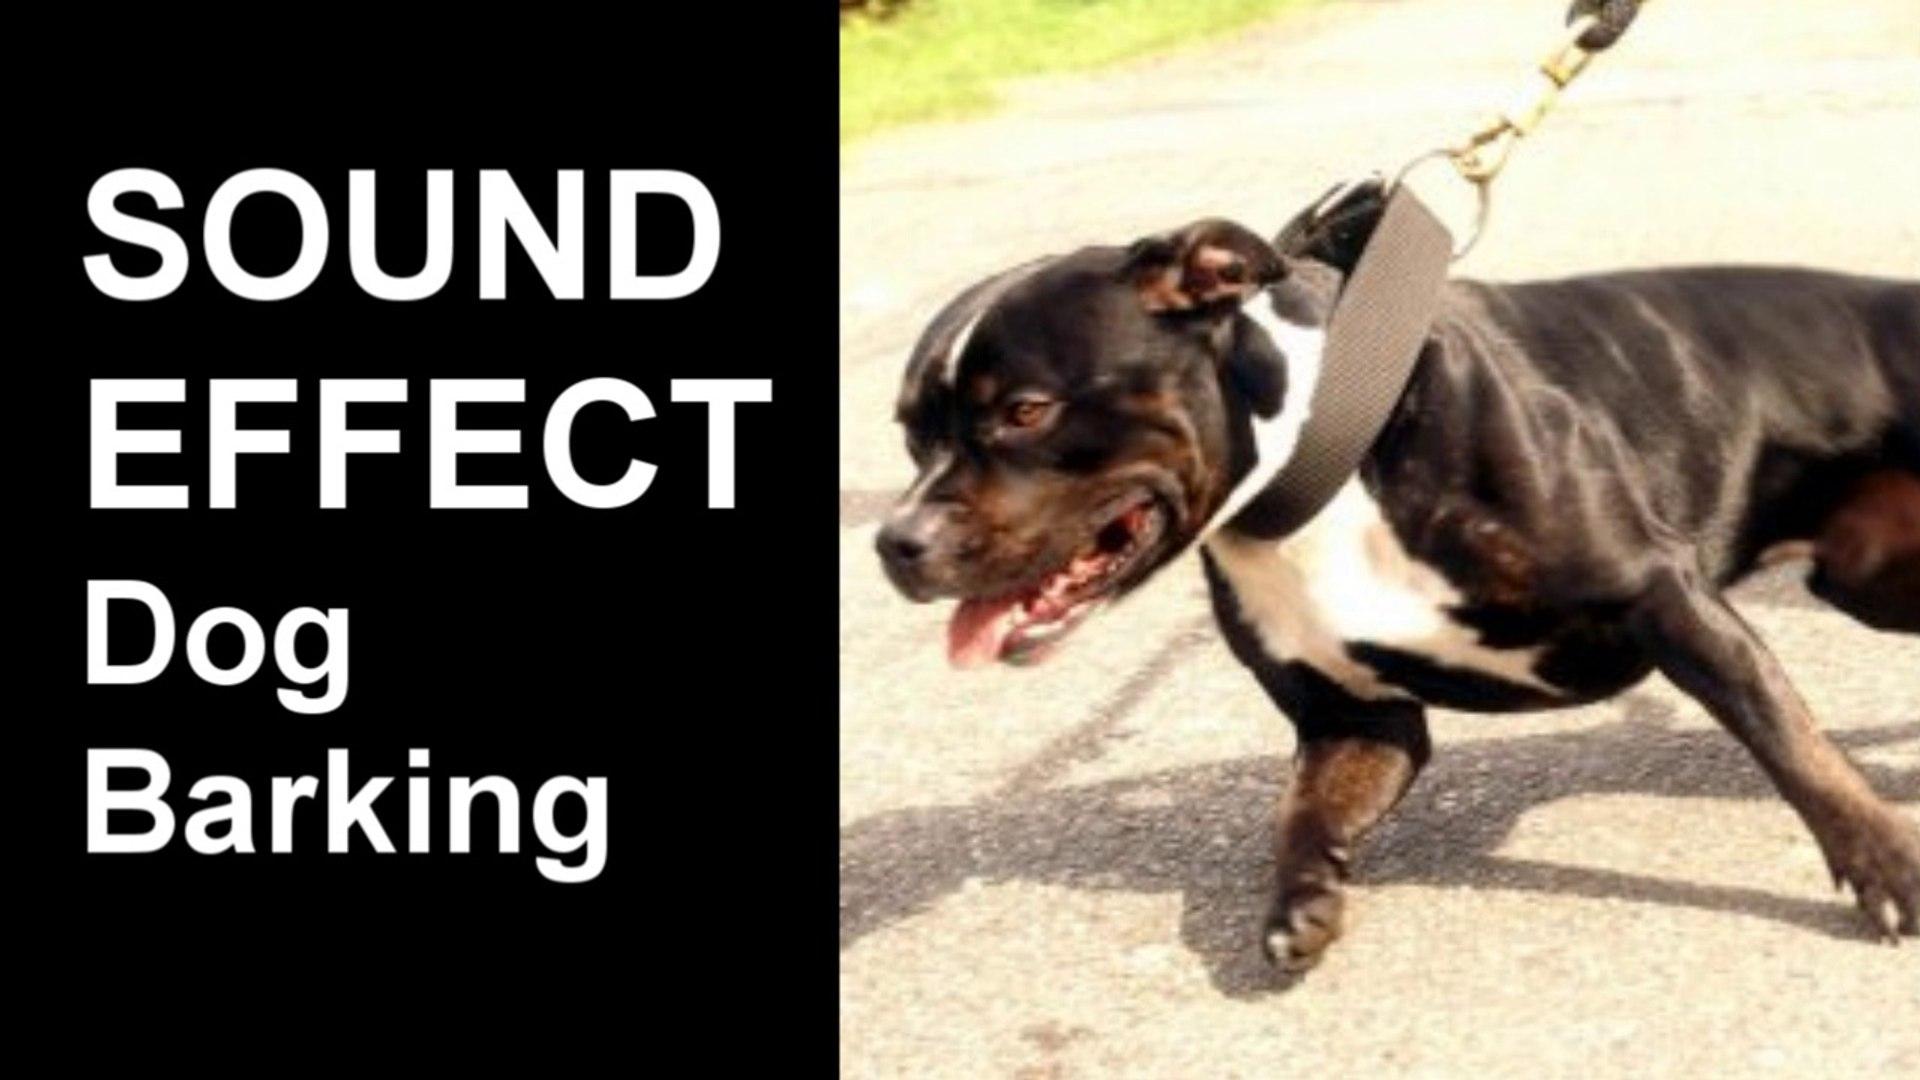 Vicious Dog Barking SOUND EFFECT Big Dog Barking,